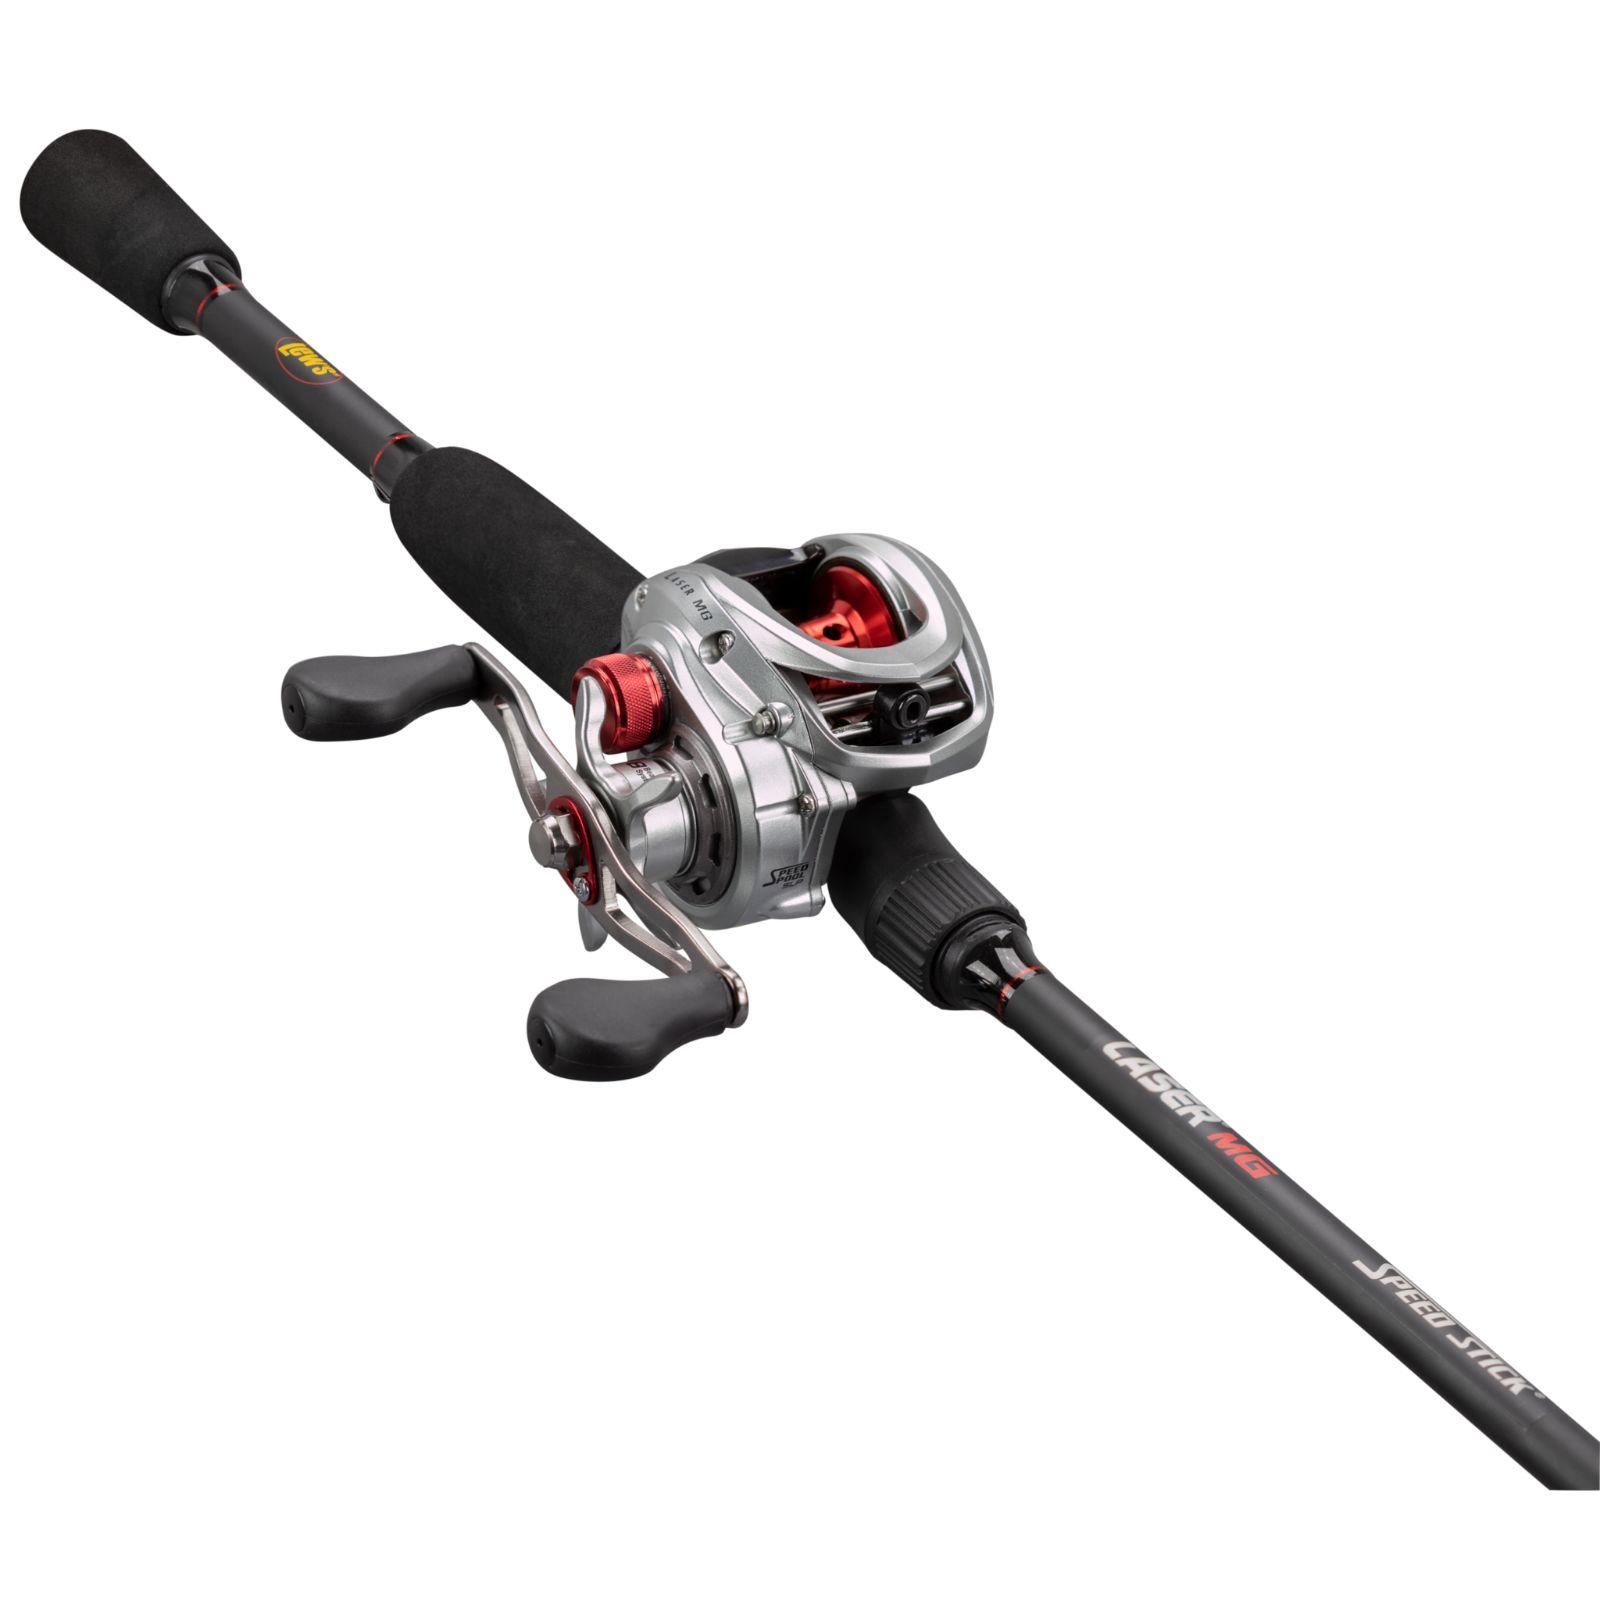 Lews Laser MG Speed Spool IM6 Combo 6ft 10in